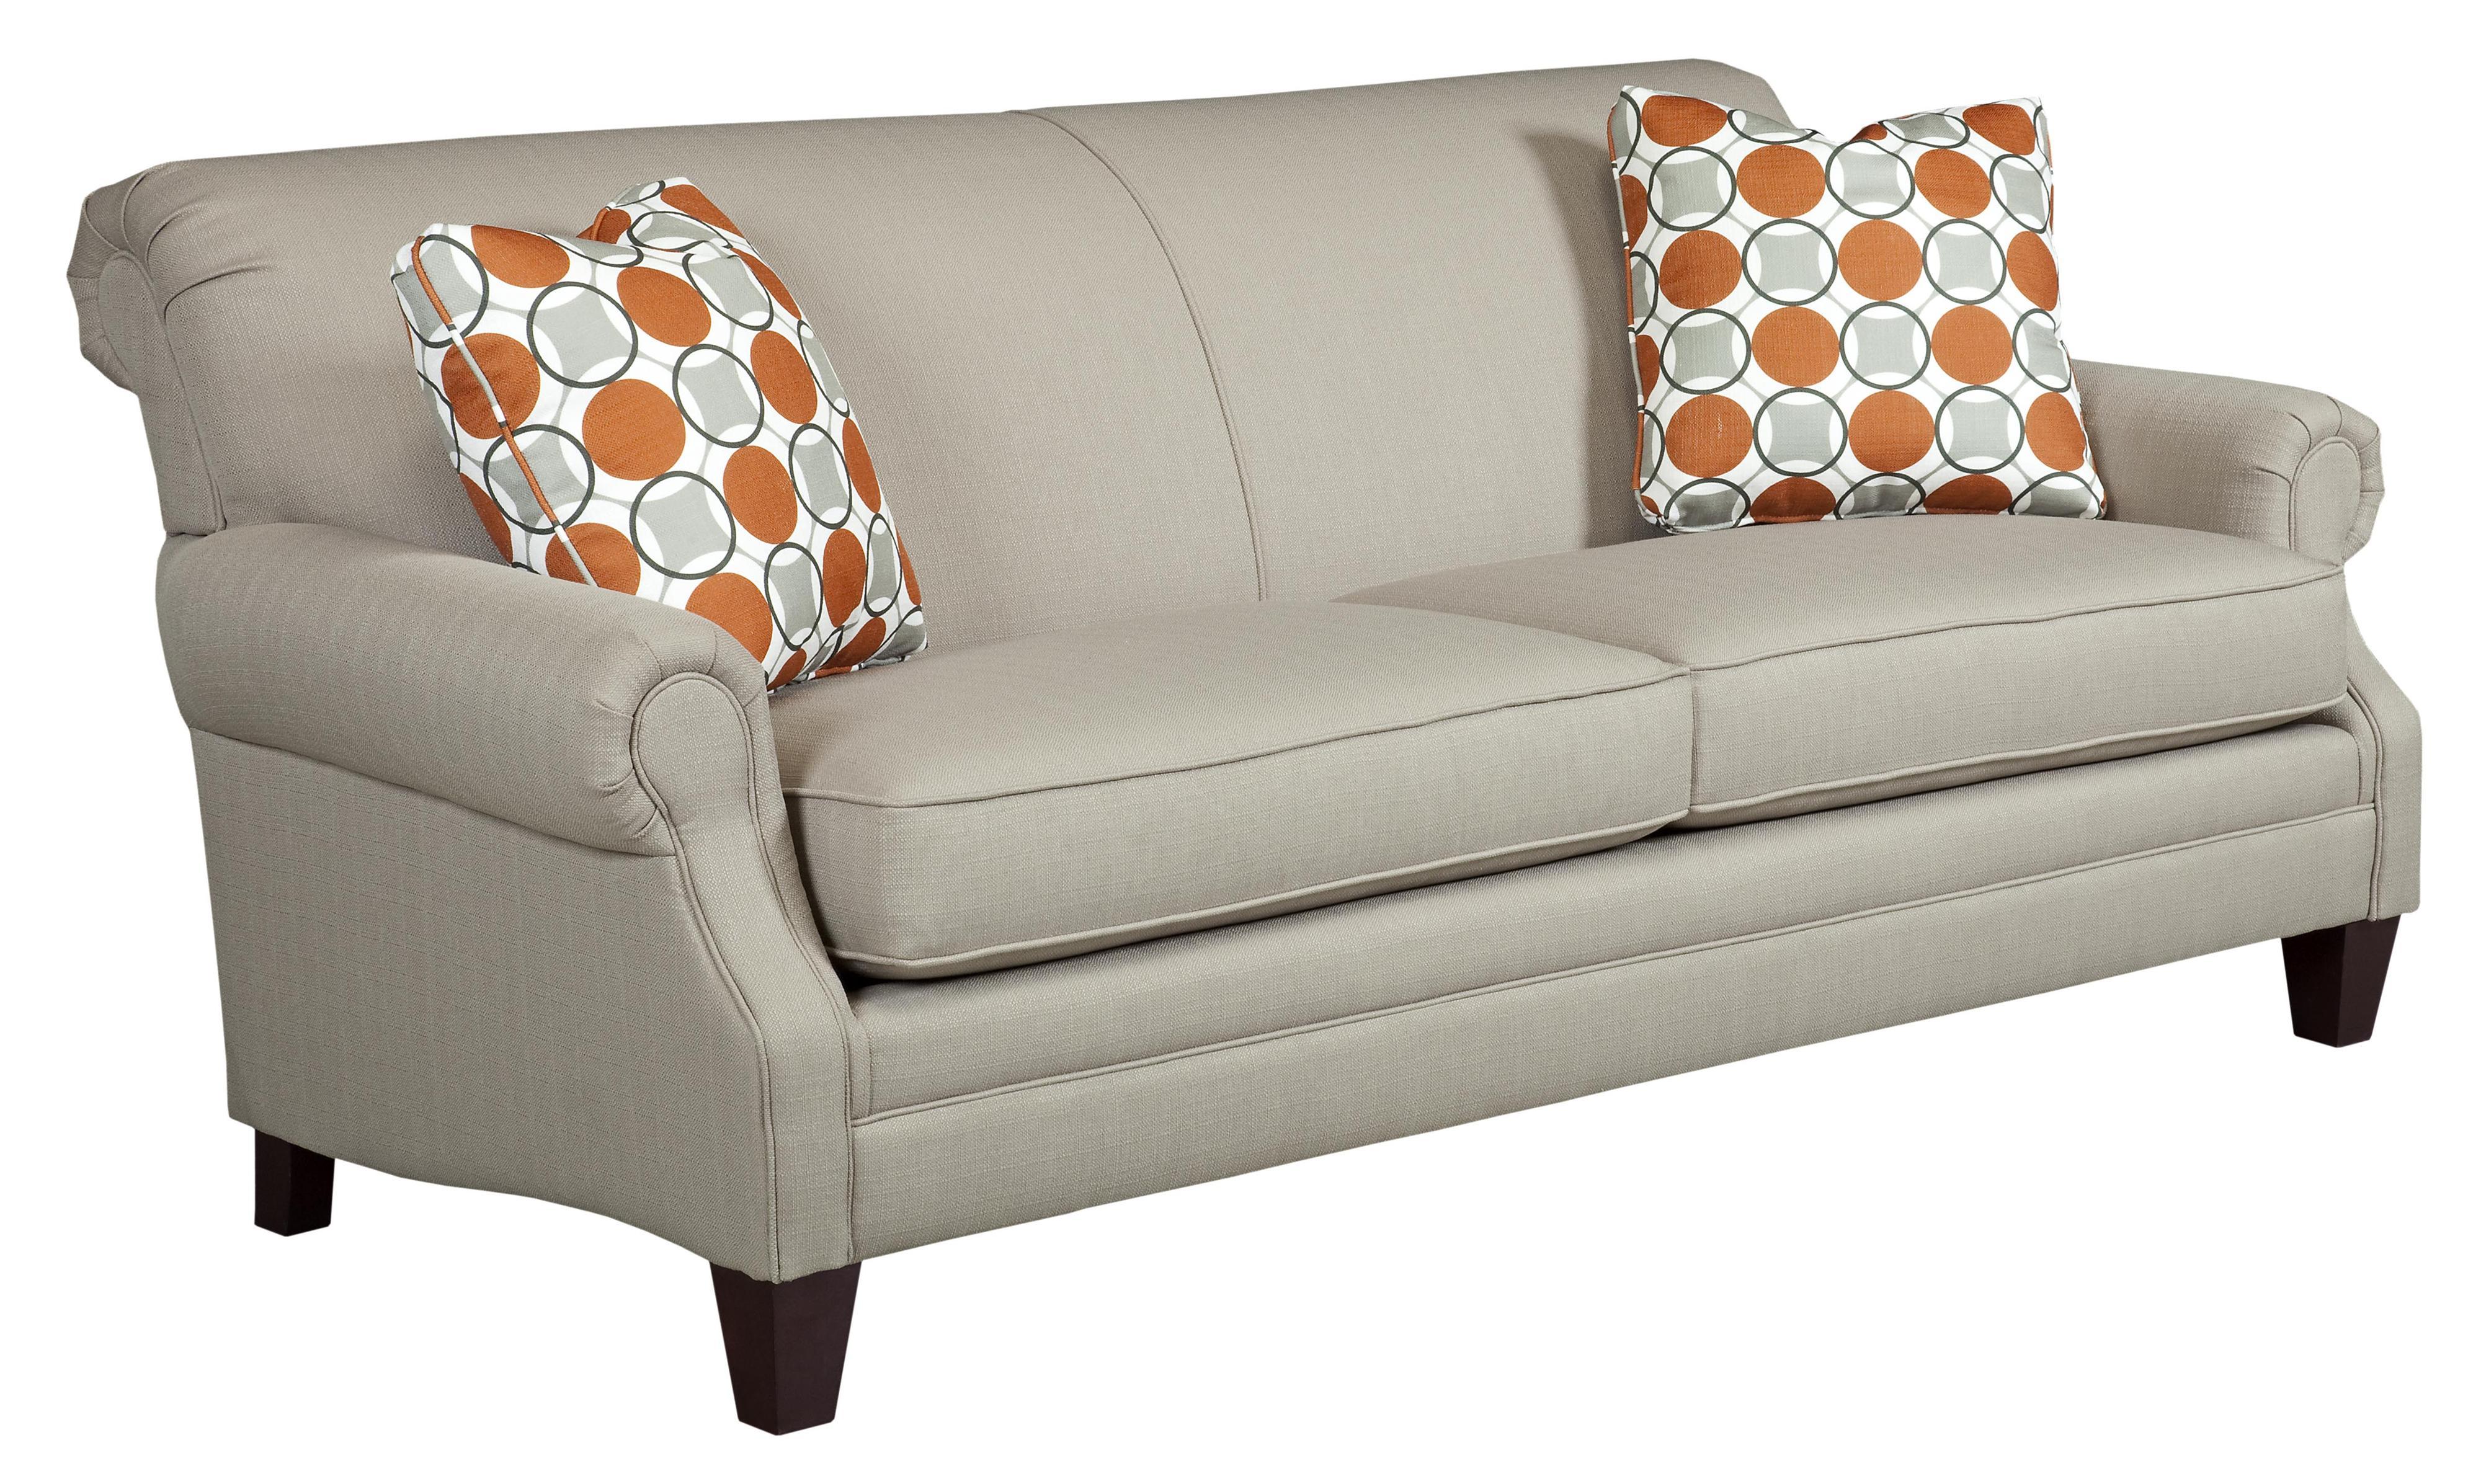 Kincaid Furniture Destin Rolled Arm Stationary Sofa Johnny Janosik Sofa